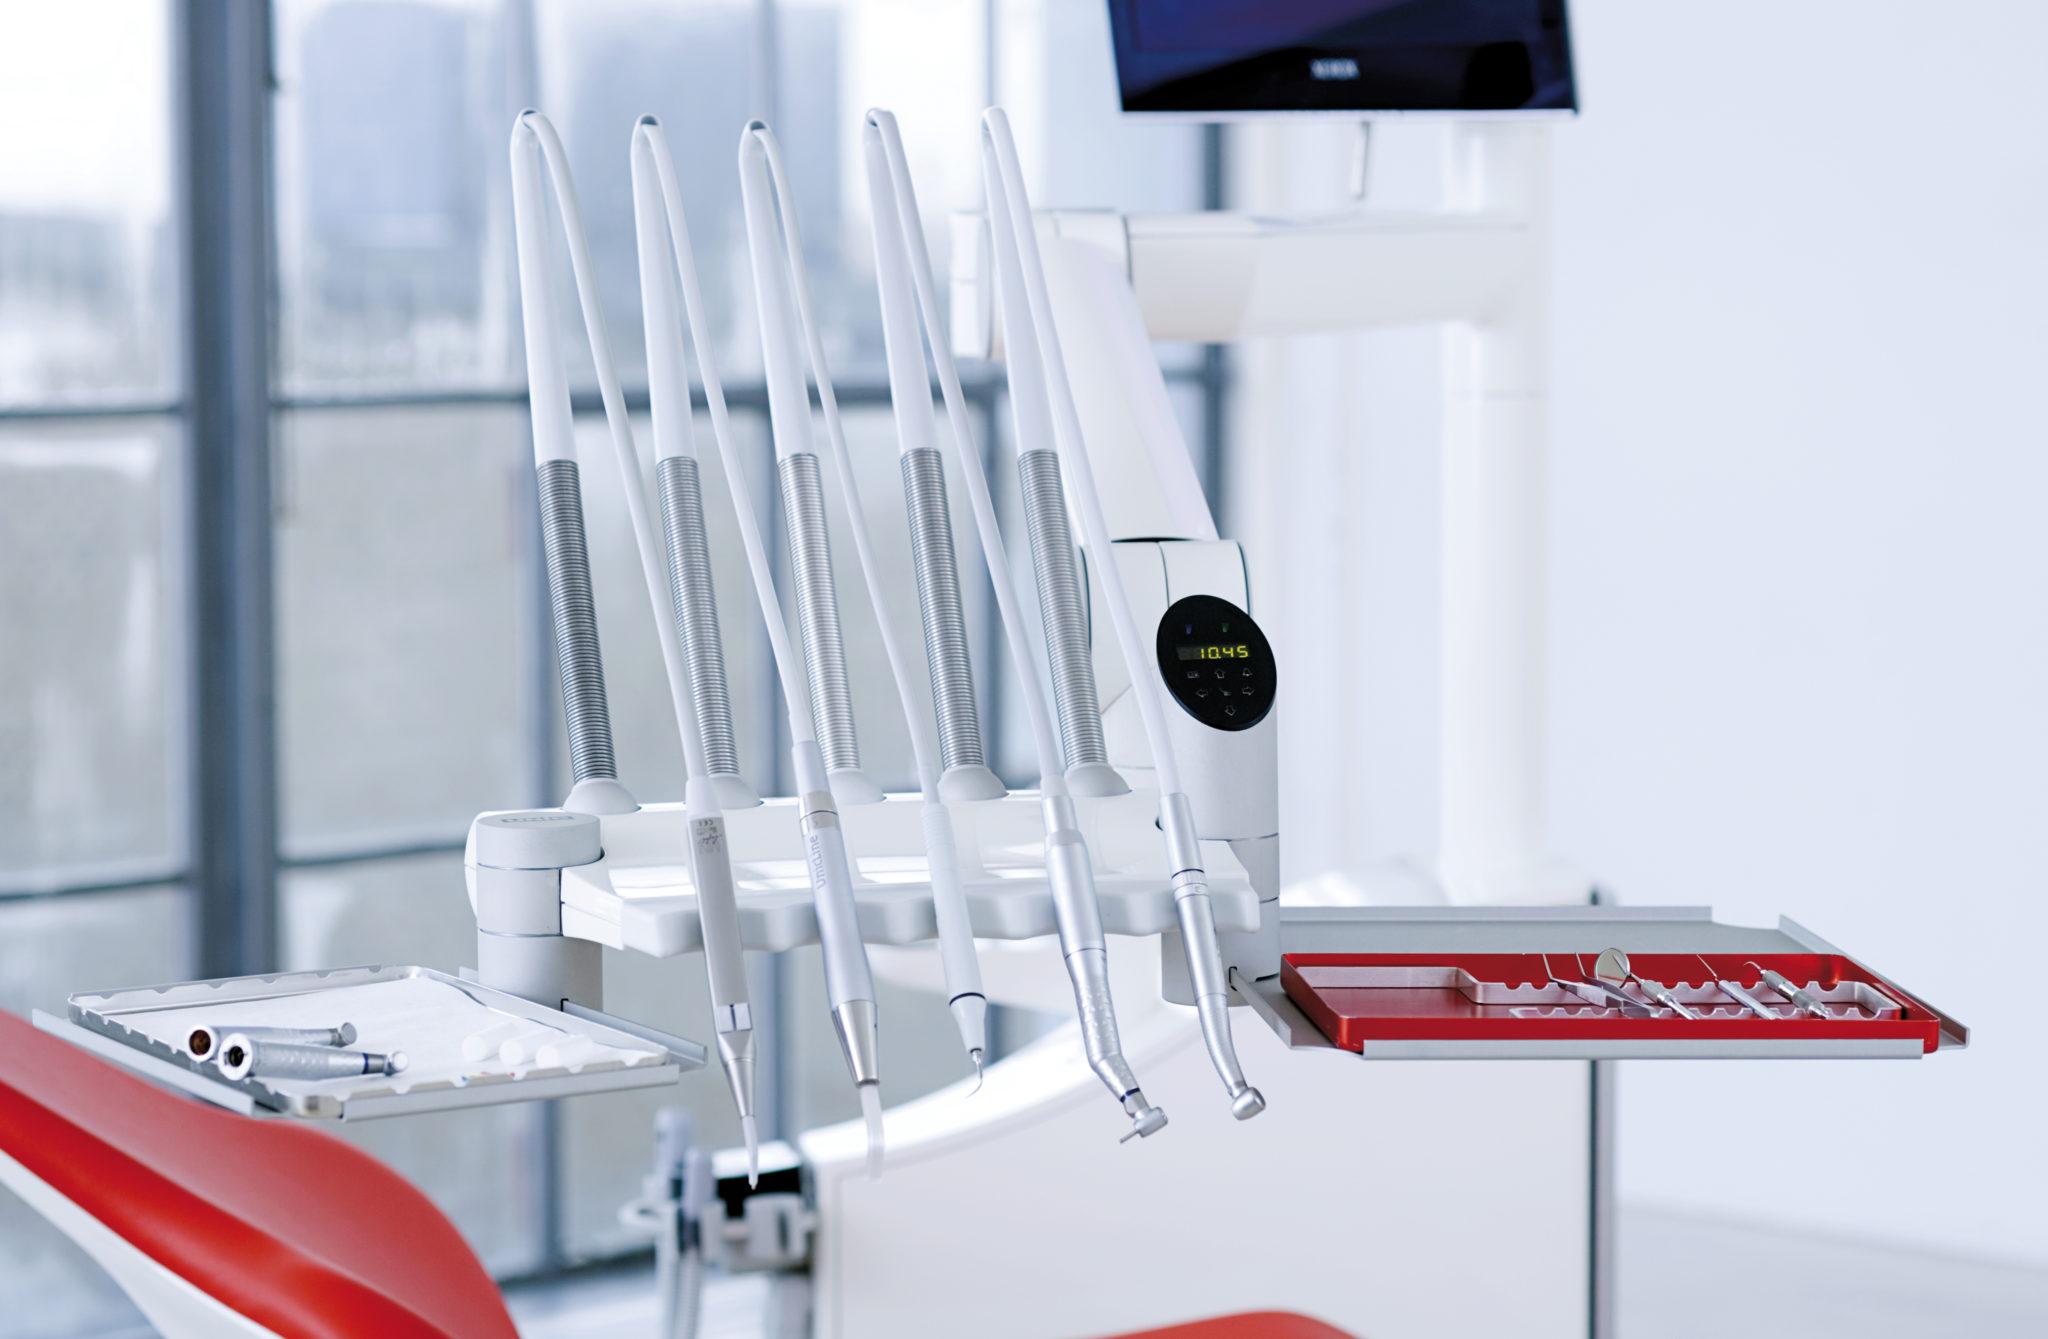 équipements et options UNIC - Hekadental